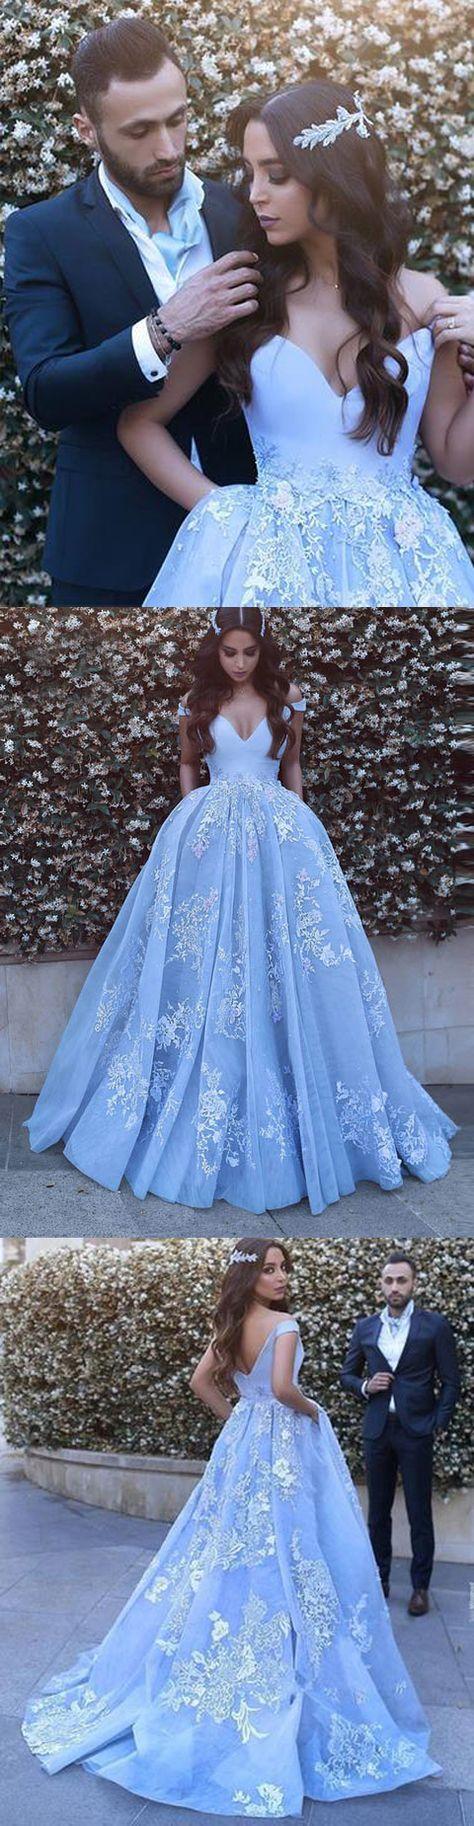 Aline prom dress offtheshoulder prom dressesevening dress with